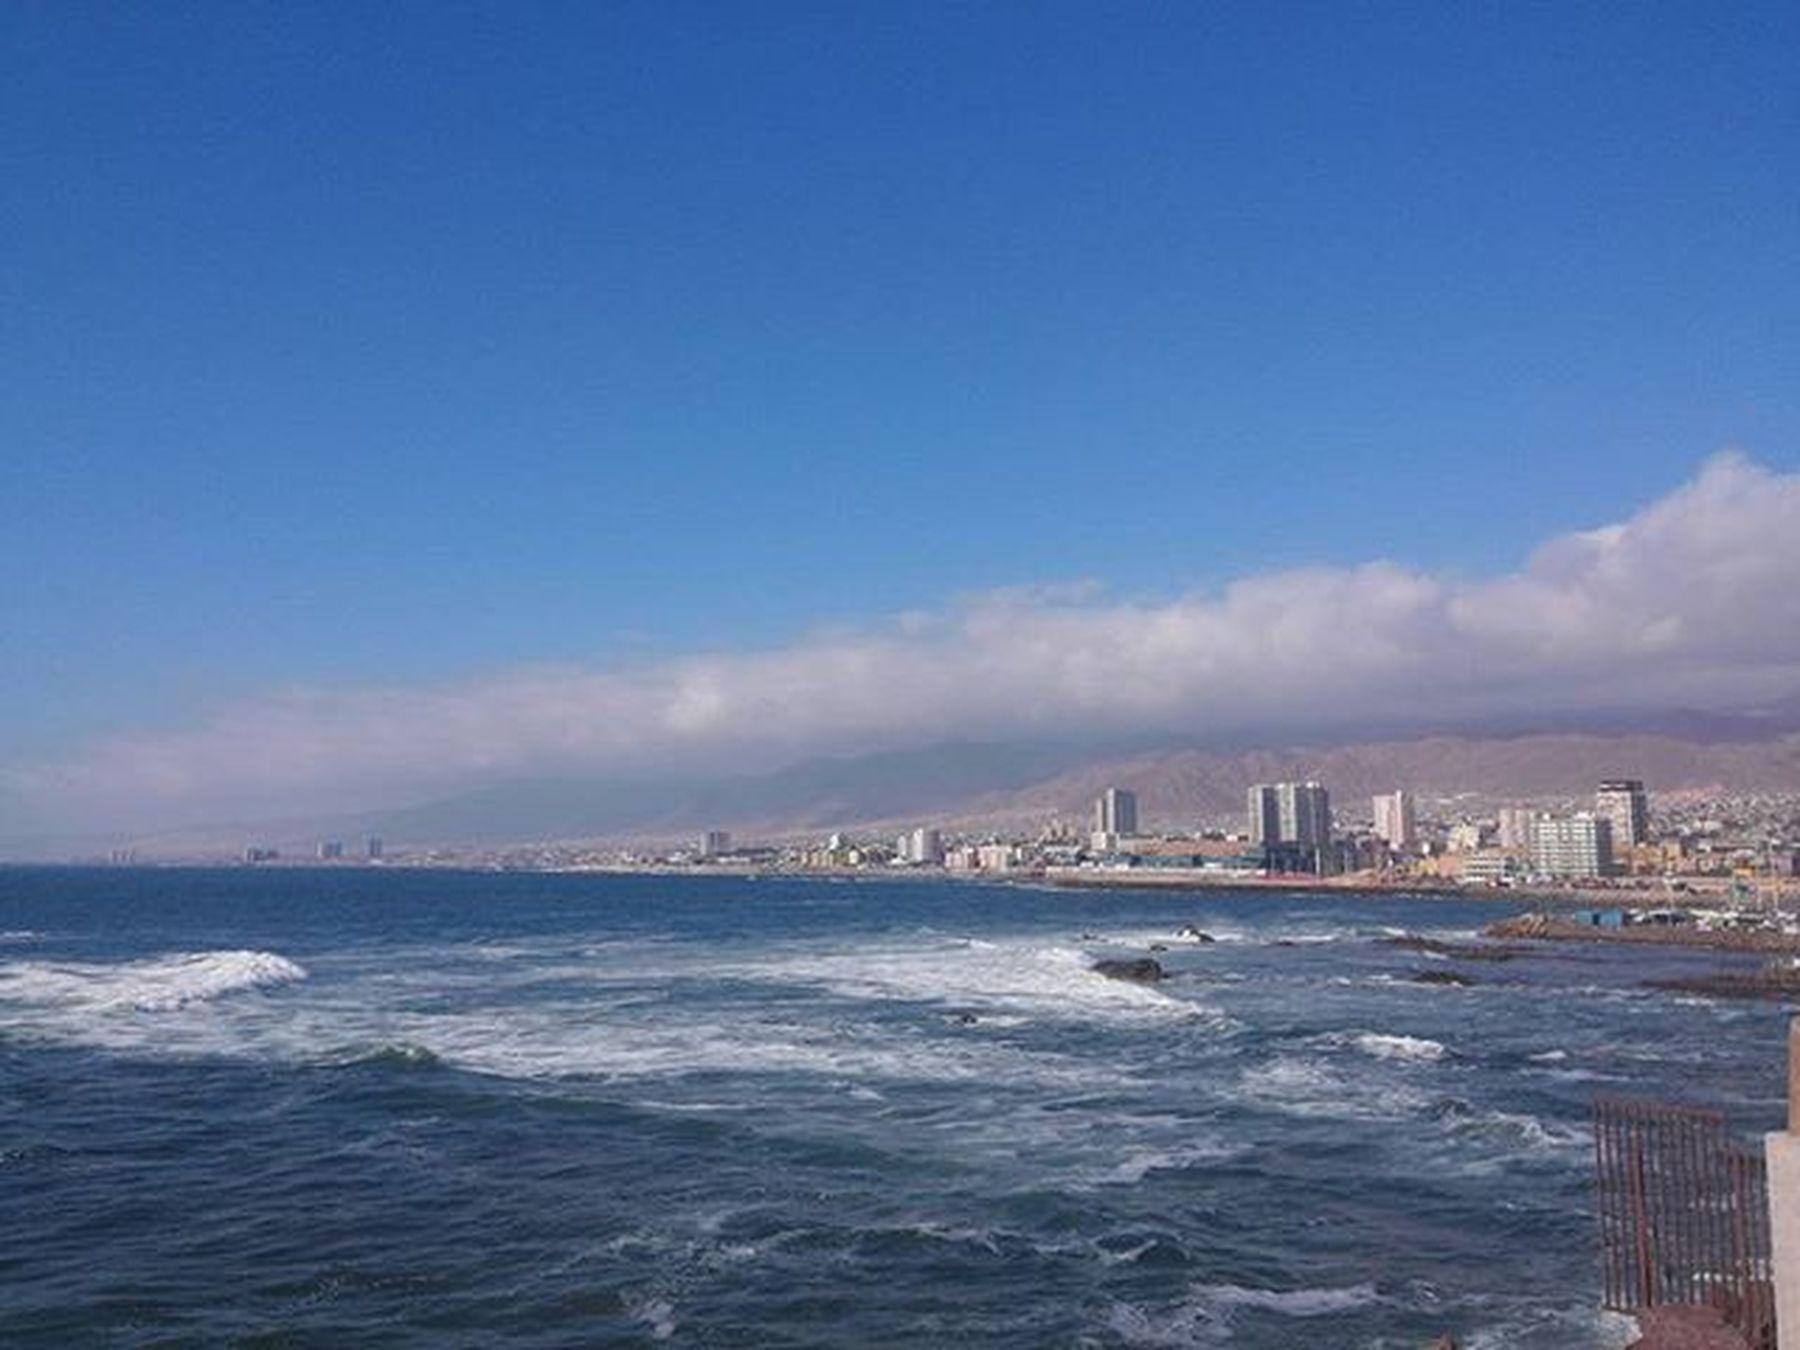 My new home for 2 years: the beautiful city of Antofagasta, Chile! Maya Papaya vaya a la playa! :) Cothinchile Extremelychile Extremenazarene Home Coast Ocean Beach Playa Antofagasta Awesome Nofilter